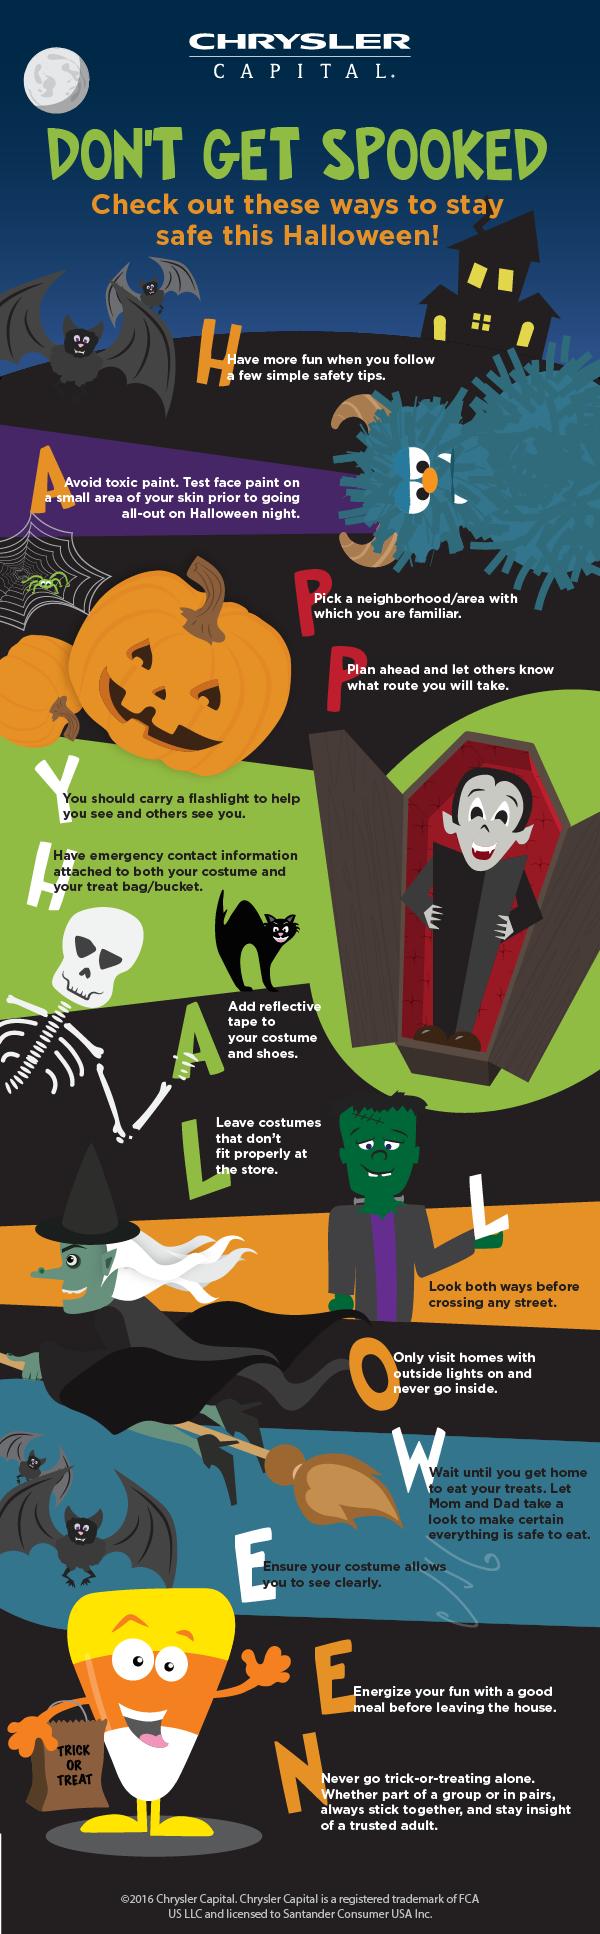 cc-info_60921-11-102516-cc-halloween-infographic-infographic-01